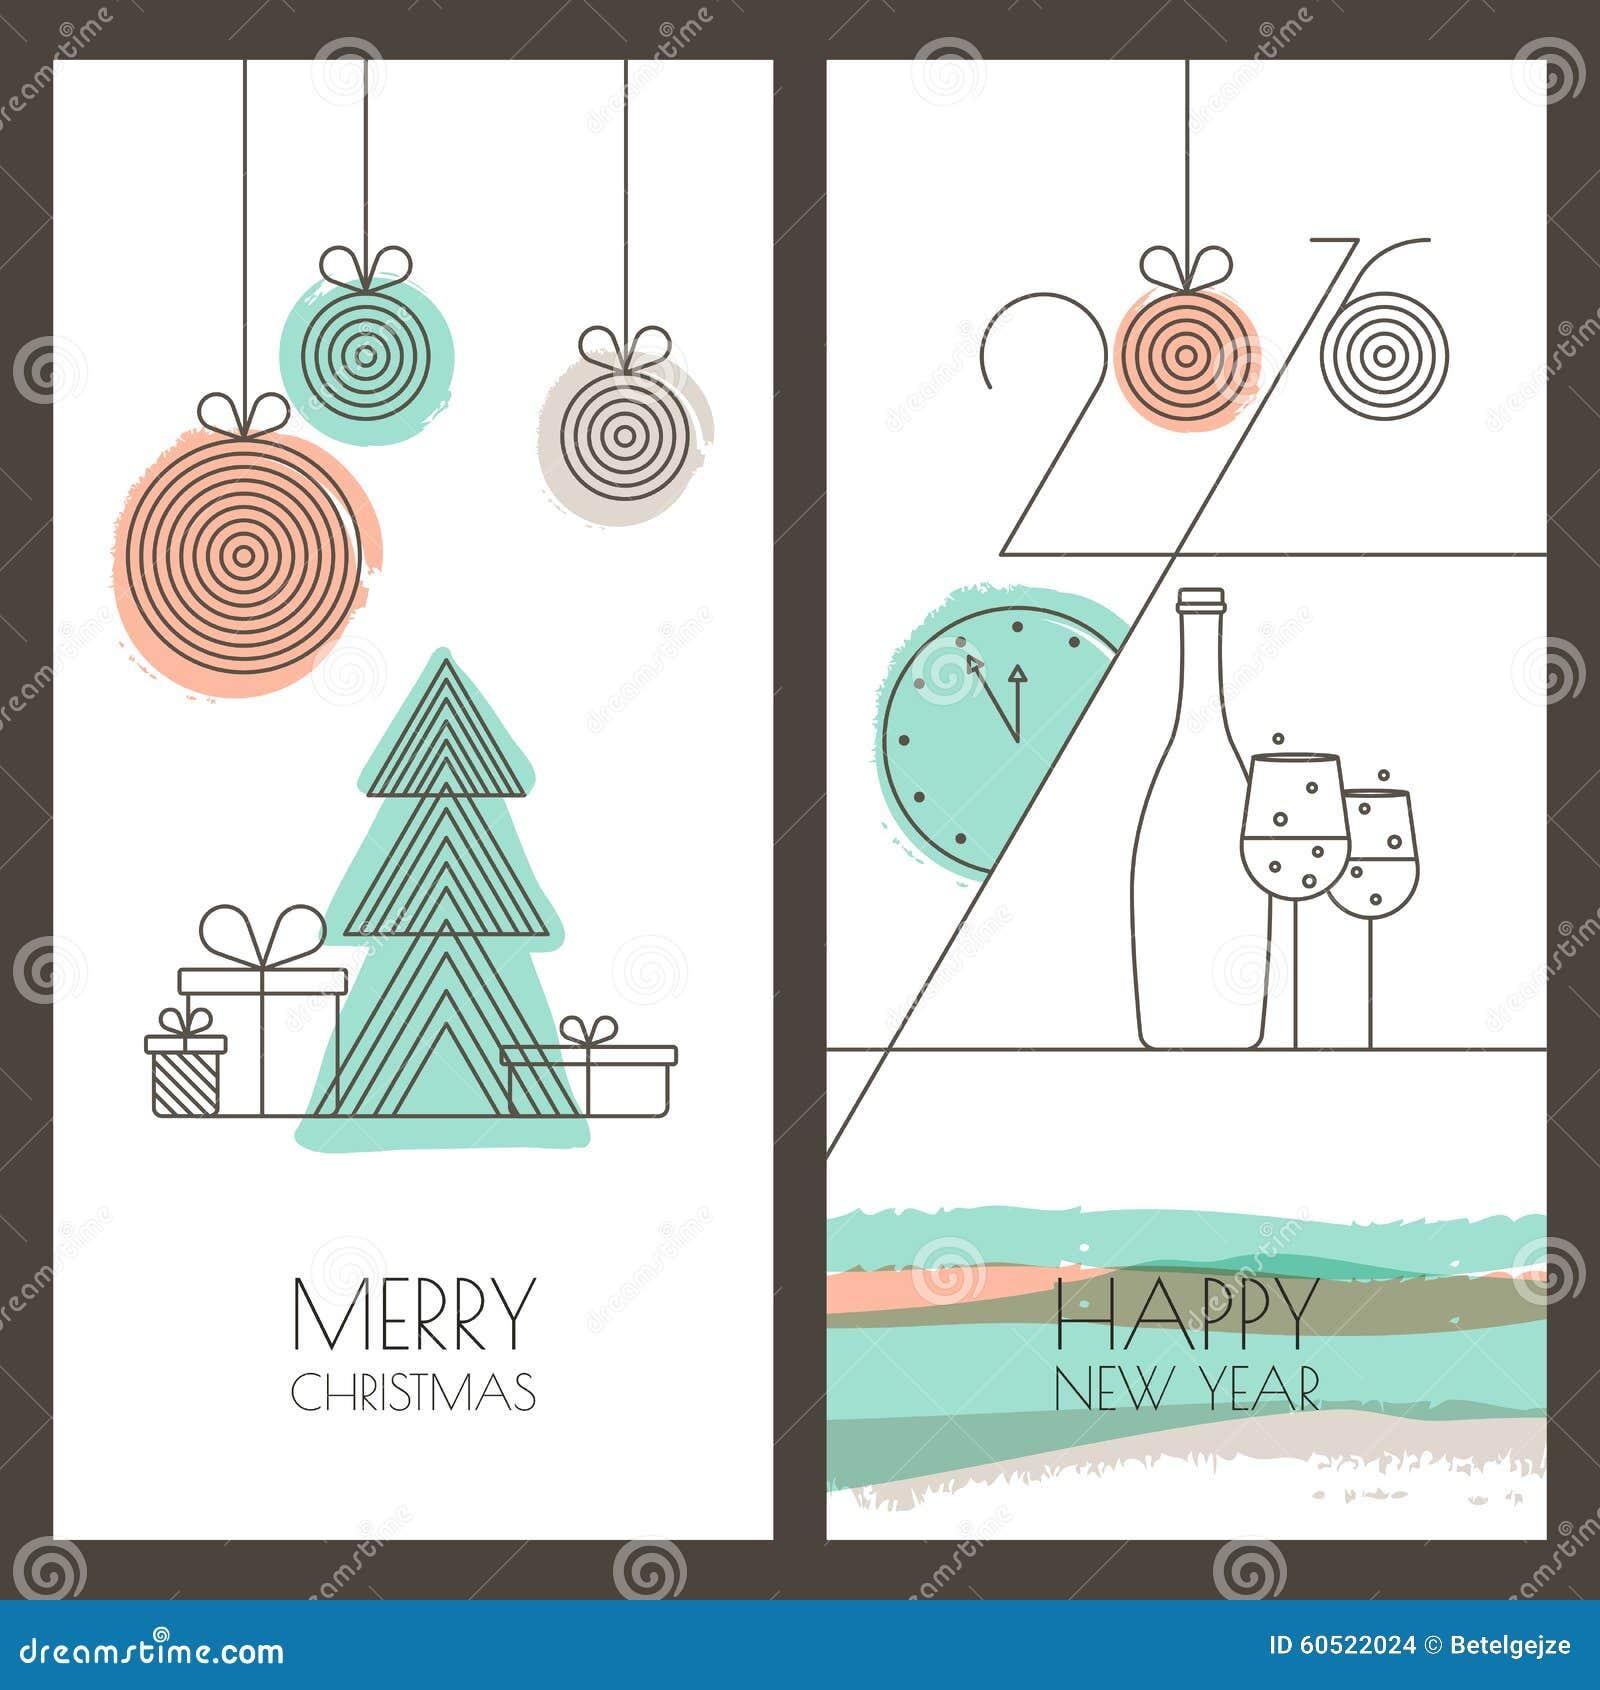 28 Set 6 Modern Stylish Greeting Card Stock Vector 582186070